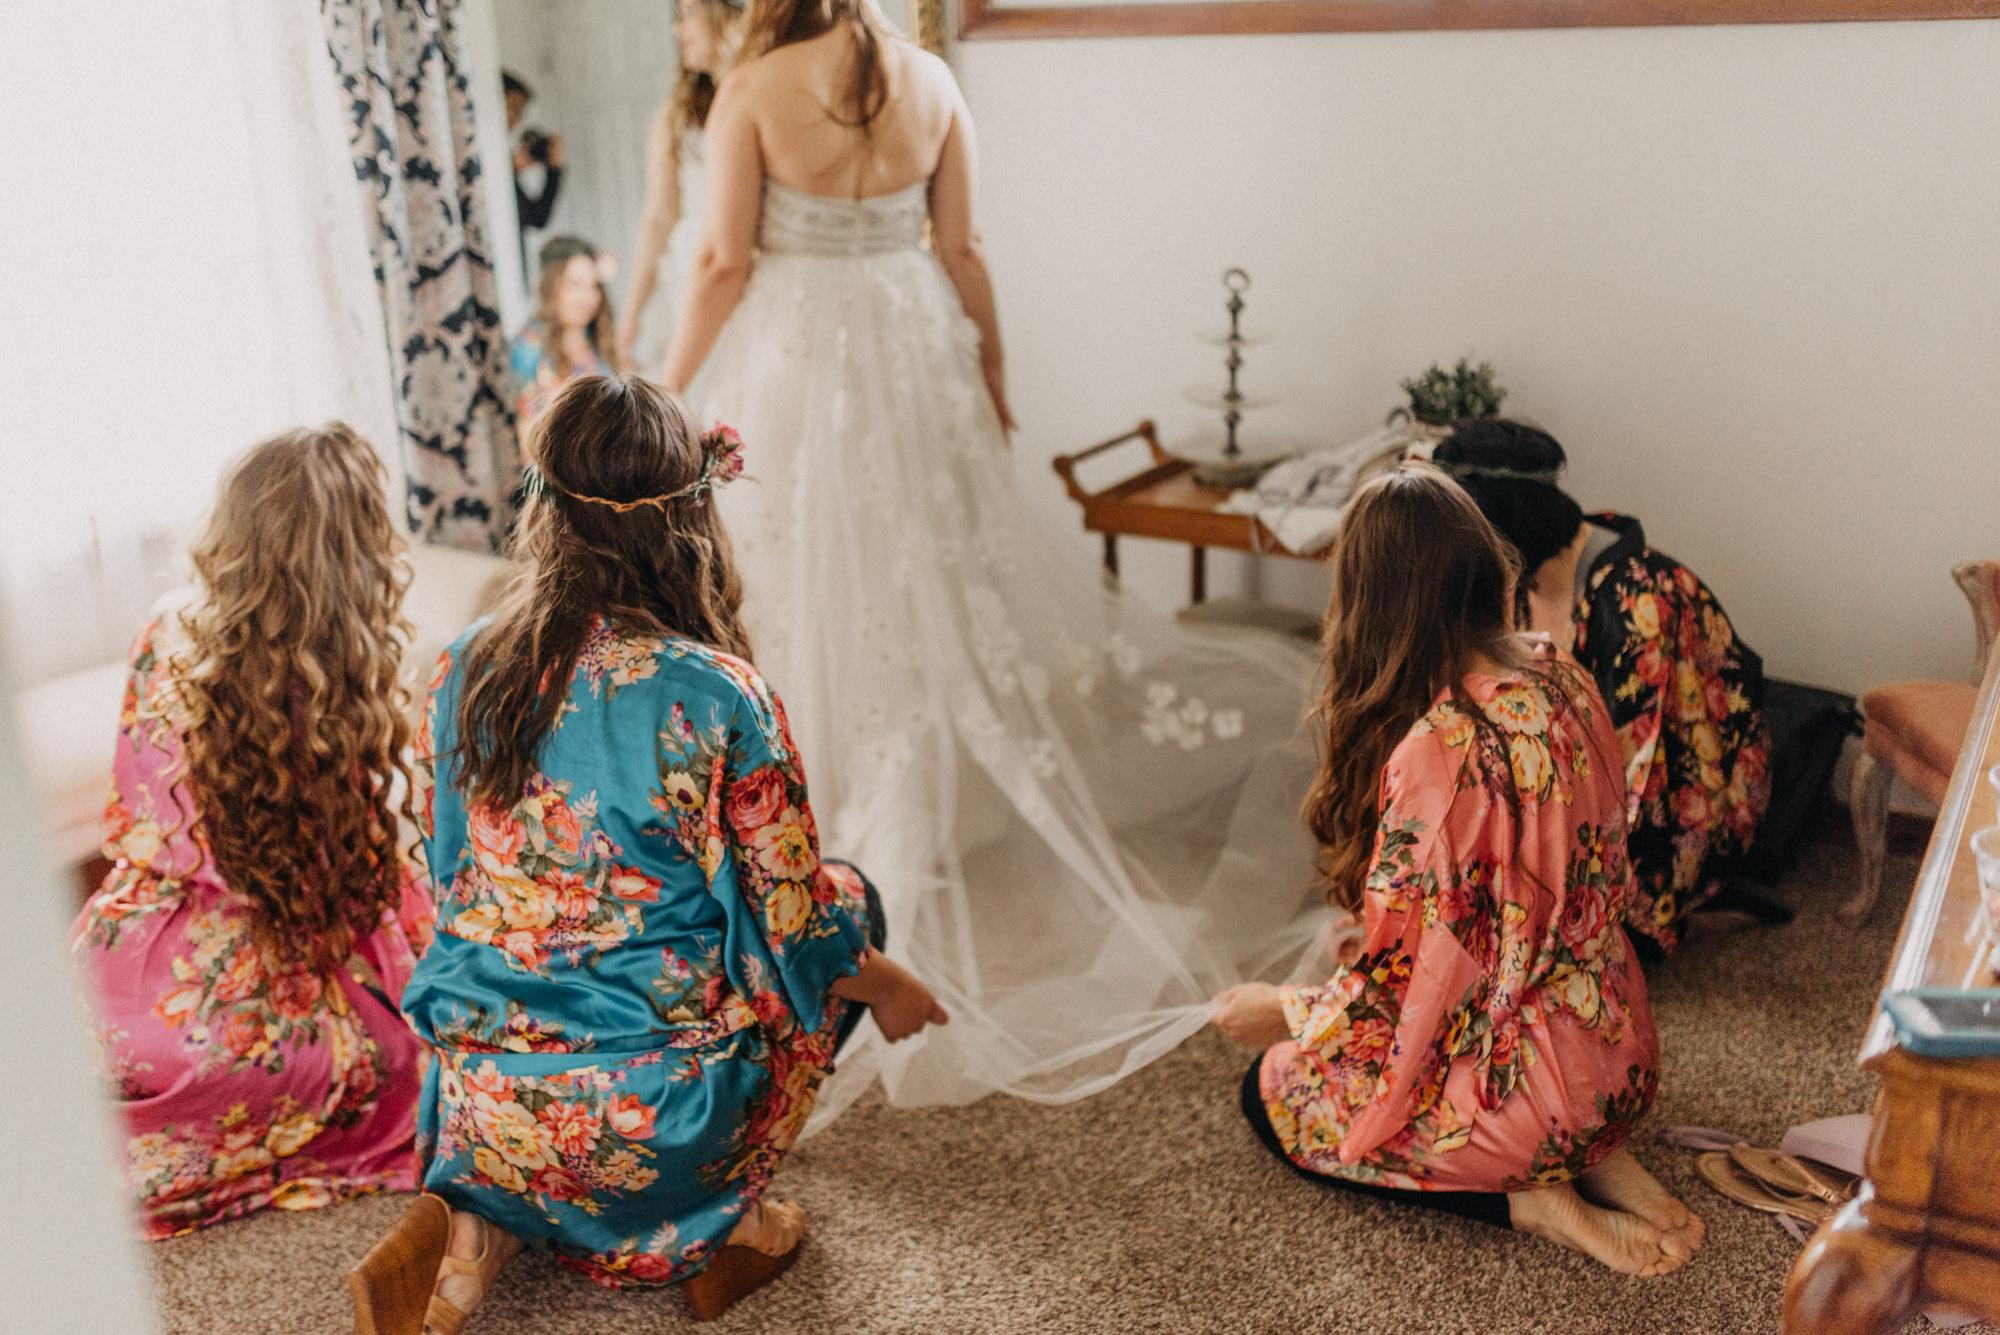 Getting-Ready-Swingset-Washington-Wedding-ringshot-8022.jpg